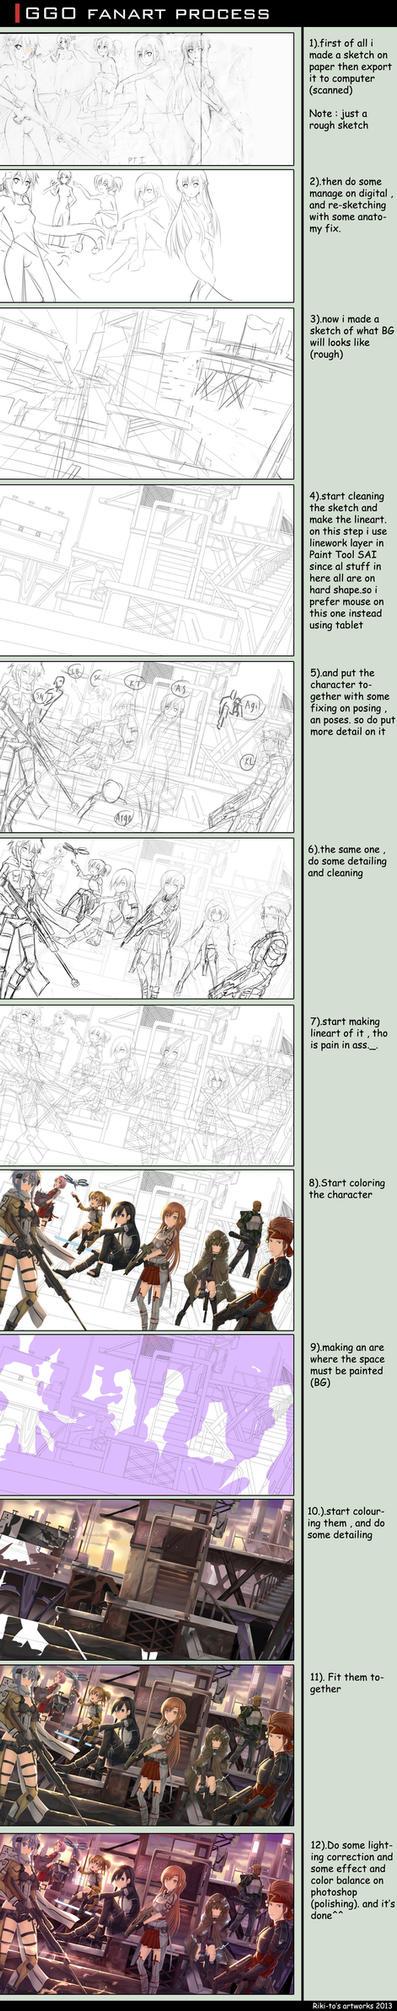 Gun Gale Online Fanart Making Process by Riki-to